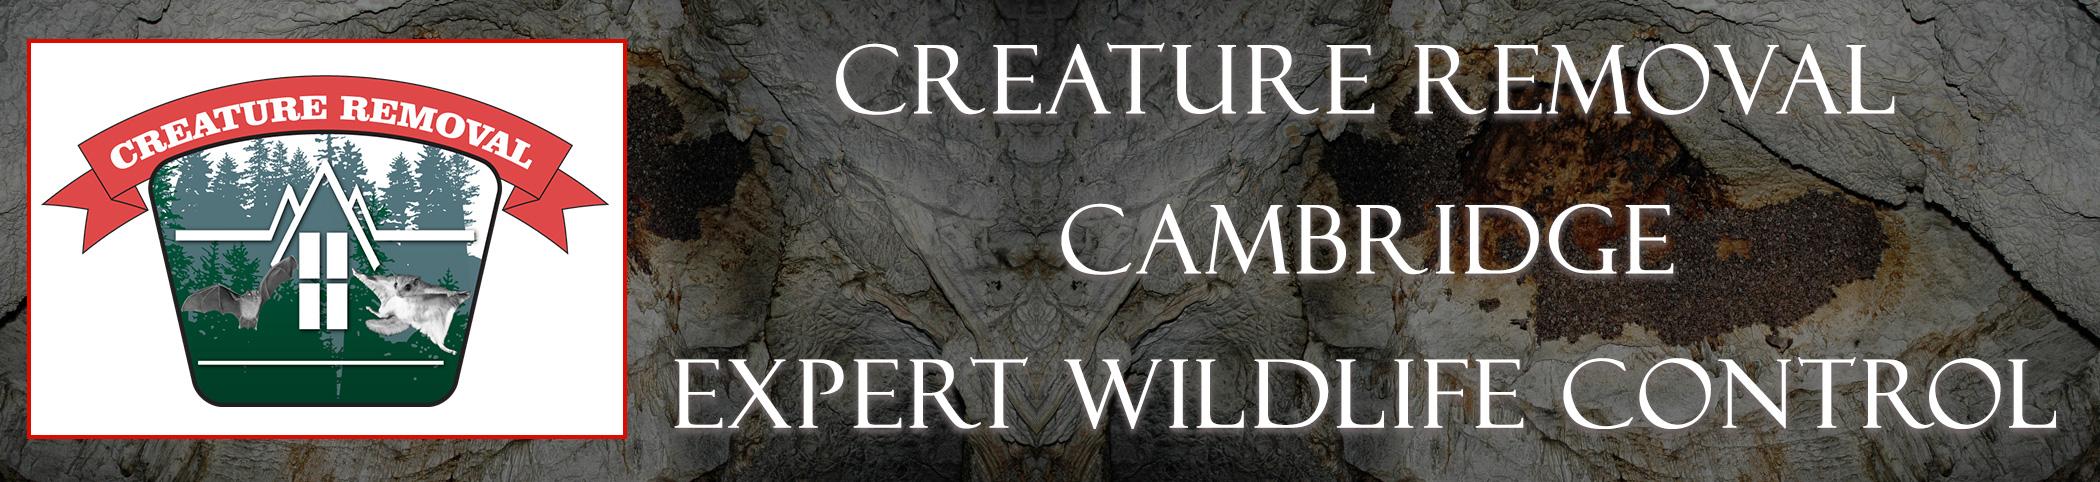 cambridge-mass-creature-removal-header